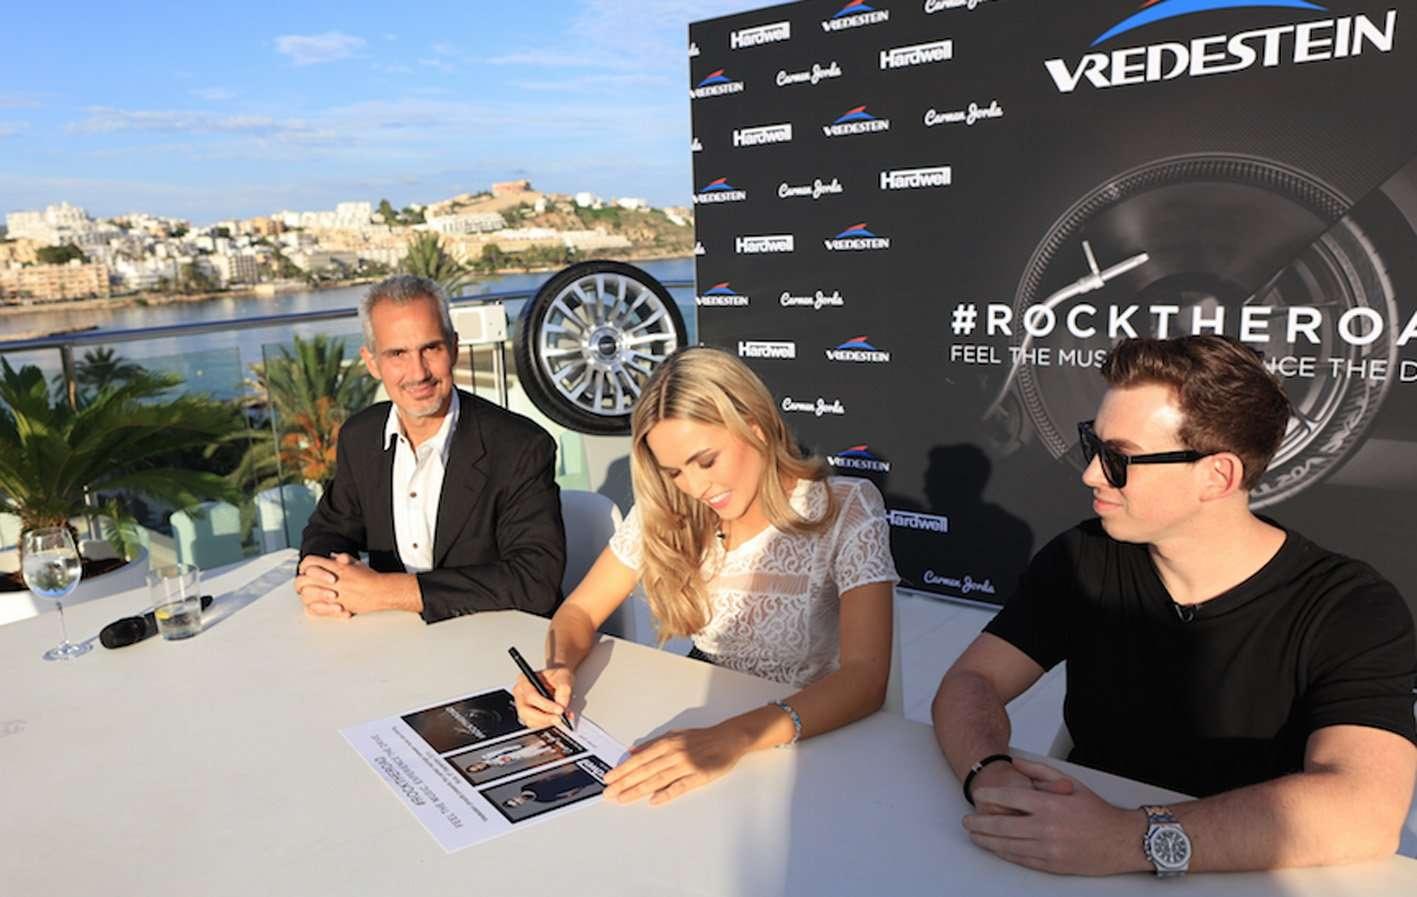 VREDESTEIN_Official signing moment_M.Paracciani CMO Apollo T-Carmen Jorda-DJ Hardwell